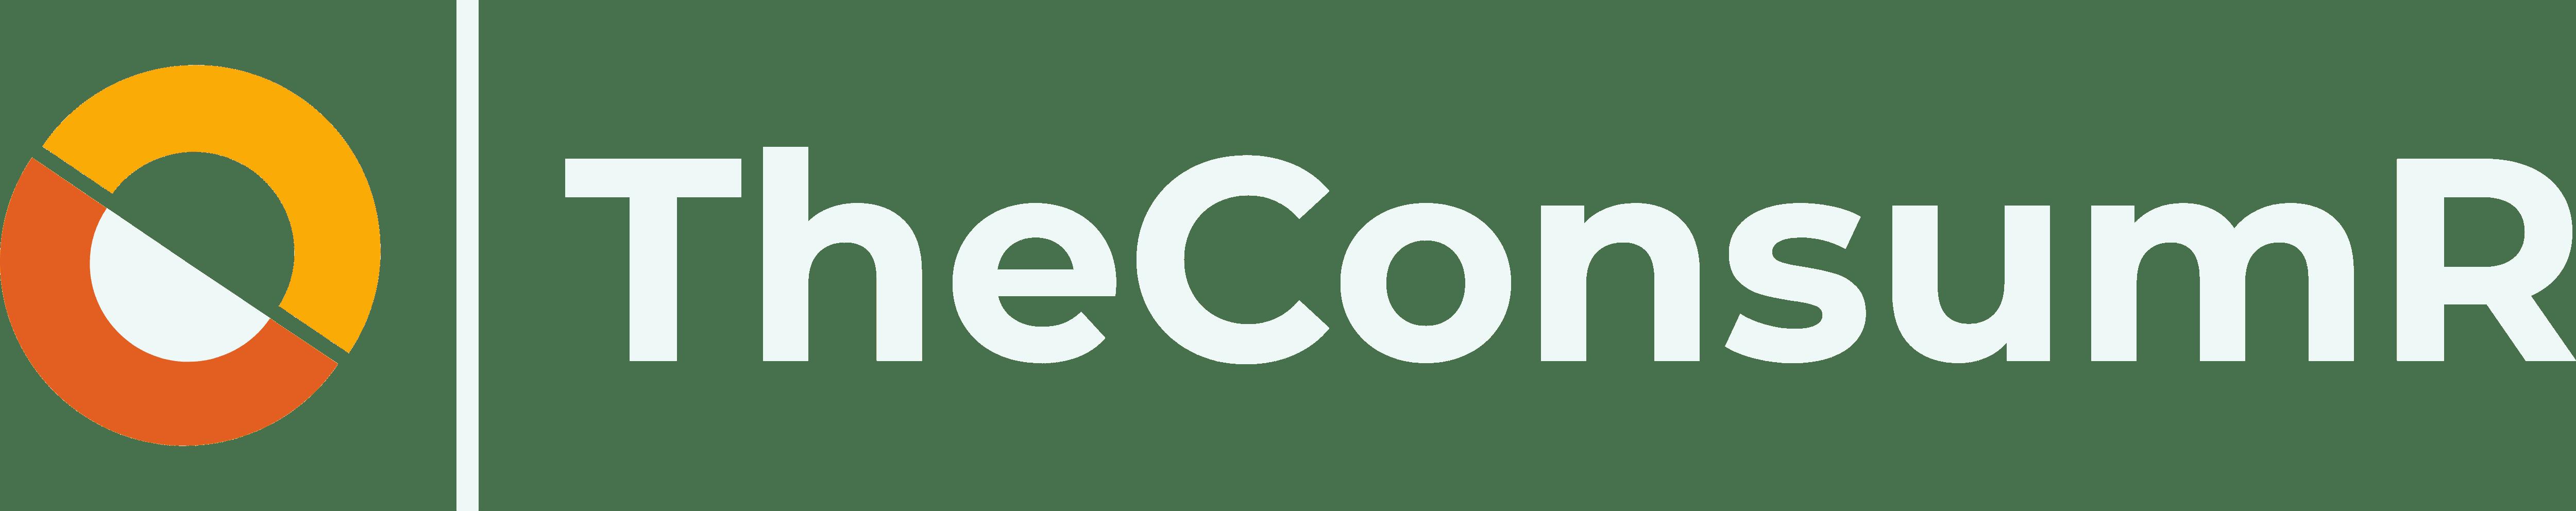 TheConsumR.com